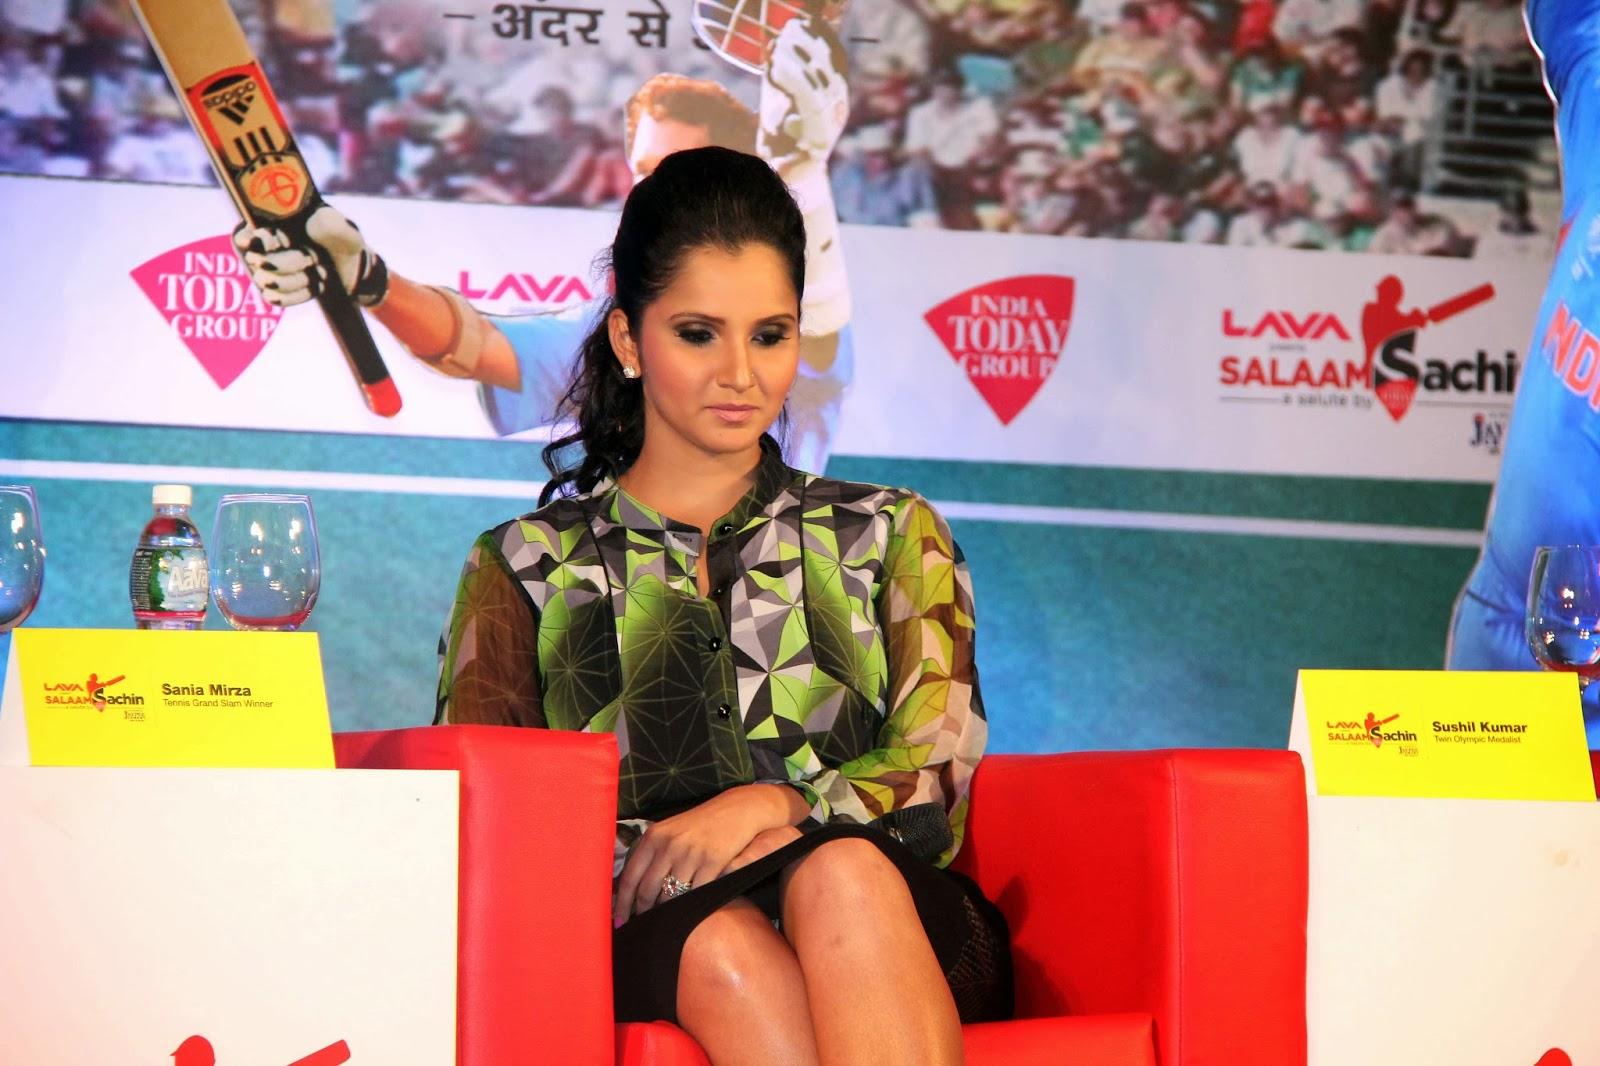 Sania mirza photos at india today group presents salaam sachin event